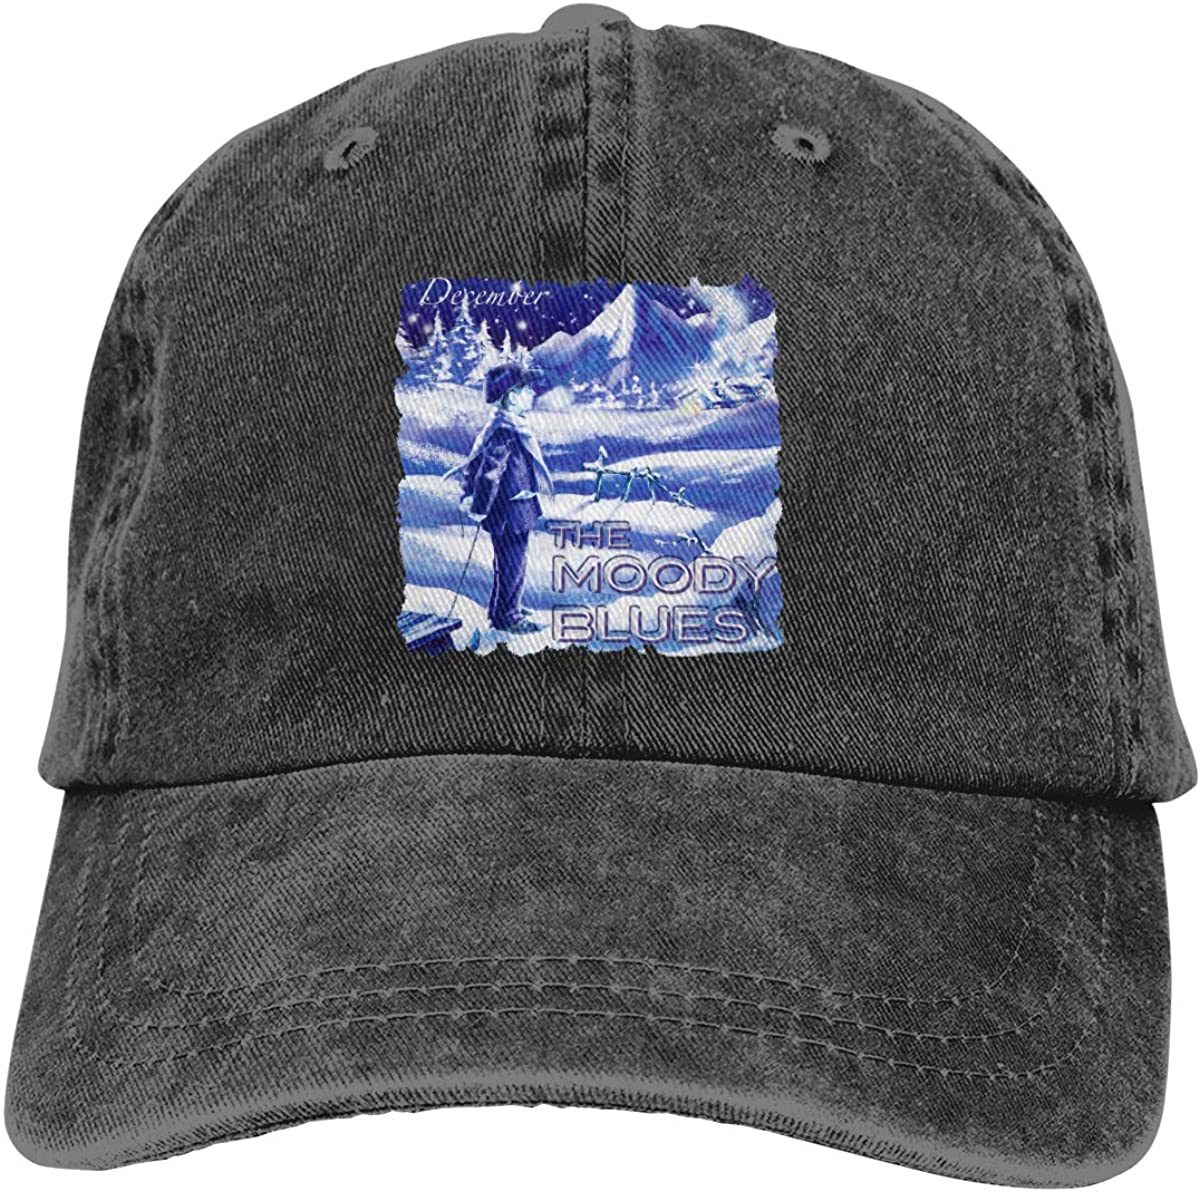 The Moody Blues December Adjustable Vintage Washed Denim Baseball Cap Casquette Cowboy Hat